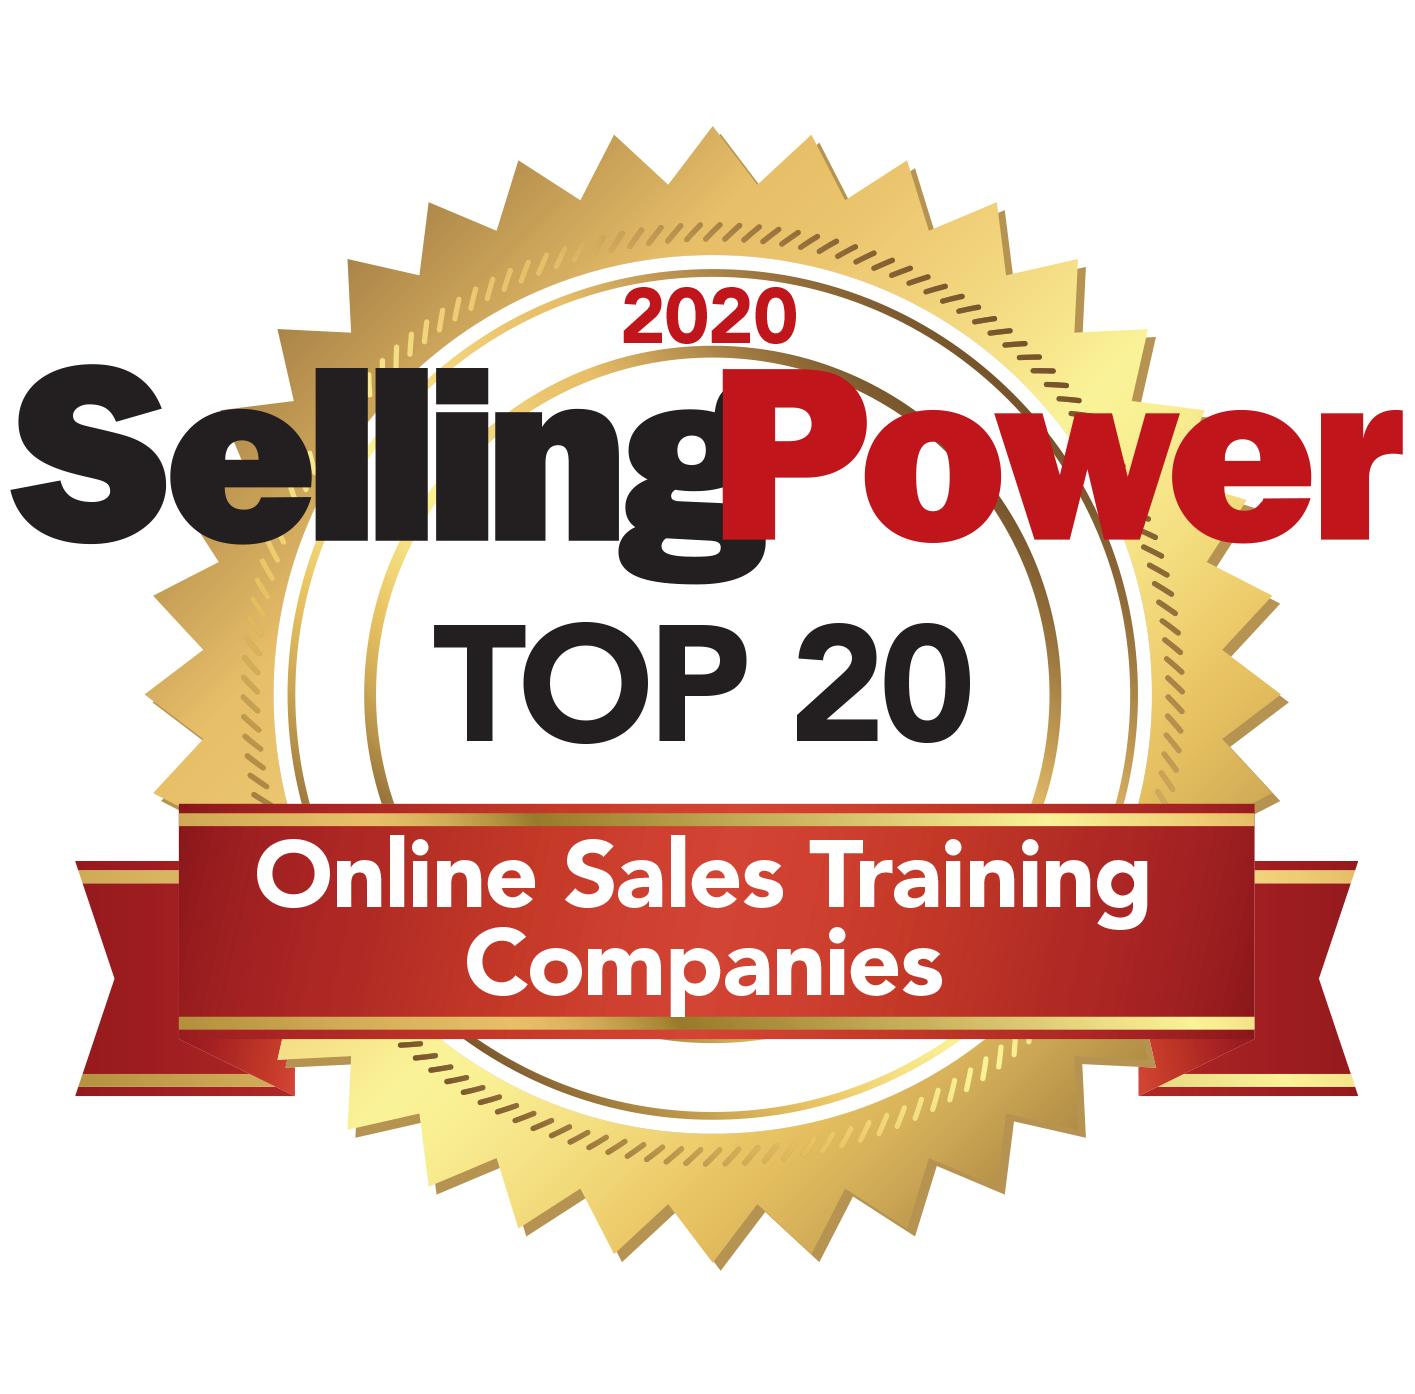 Top 20 Virtual Sales Training Companies in 2020 - Selling Power